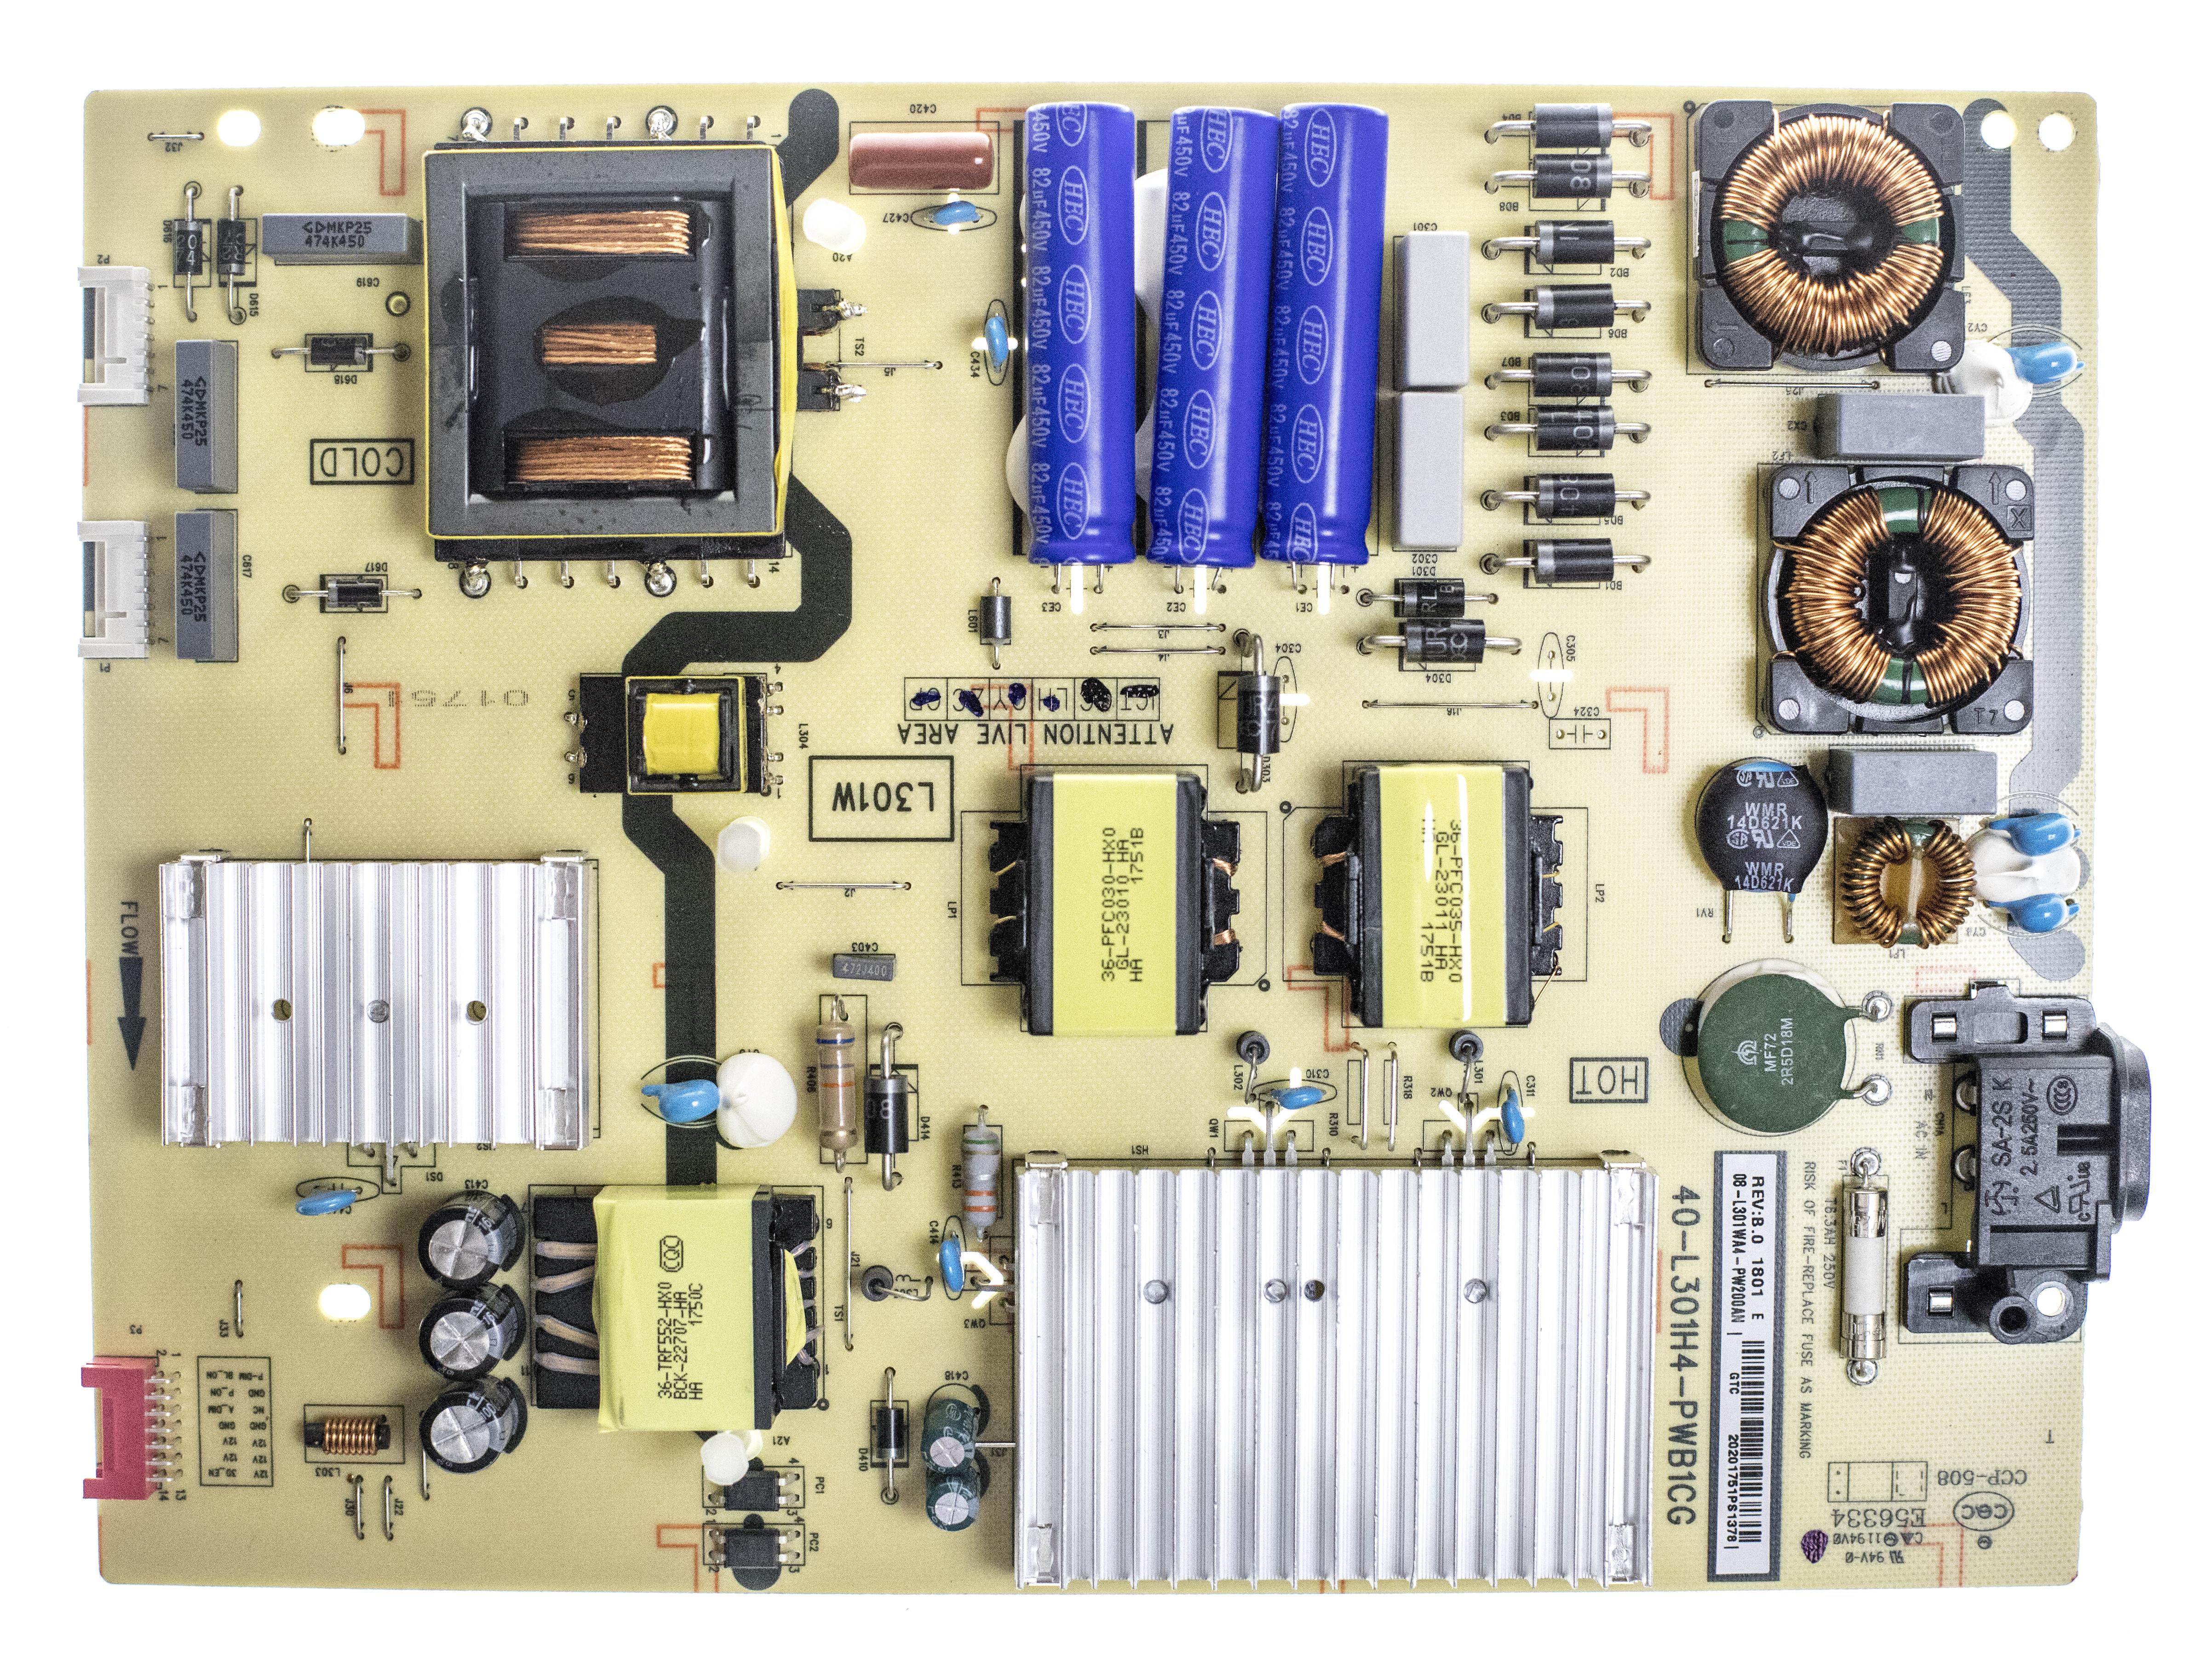 TCL 08-L301WA4-PW200AN (40-L301H4-PWB1CG) Power Supply 65S405 65S401